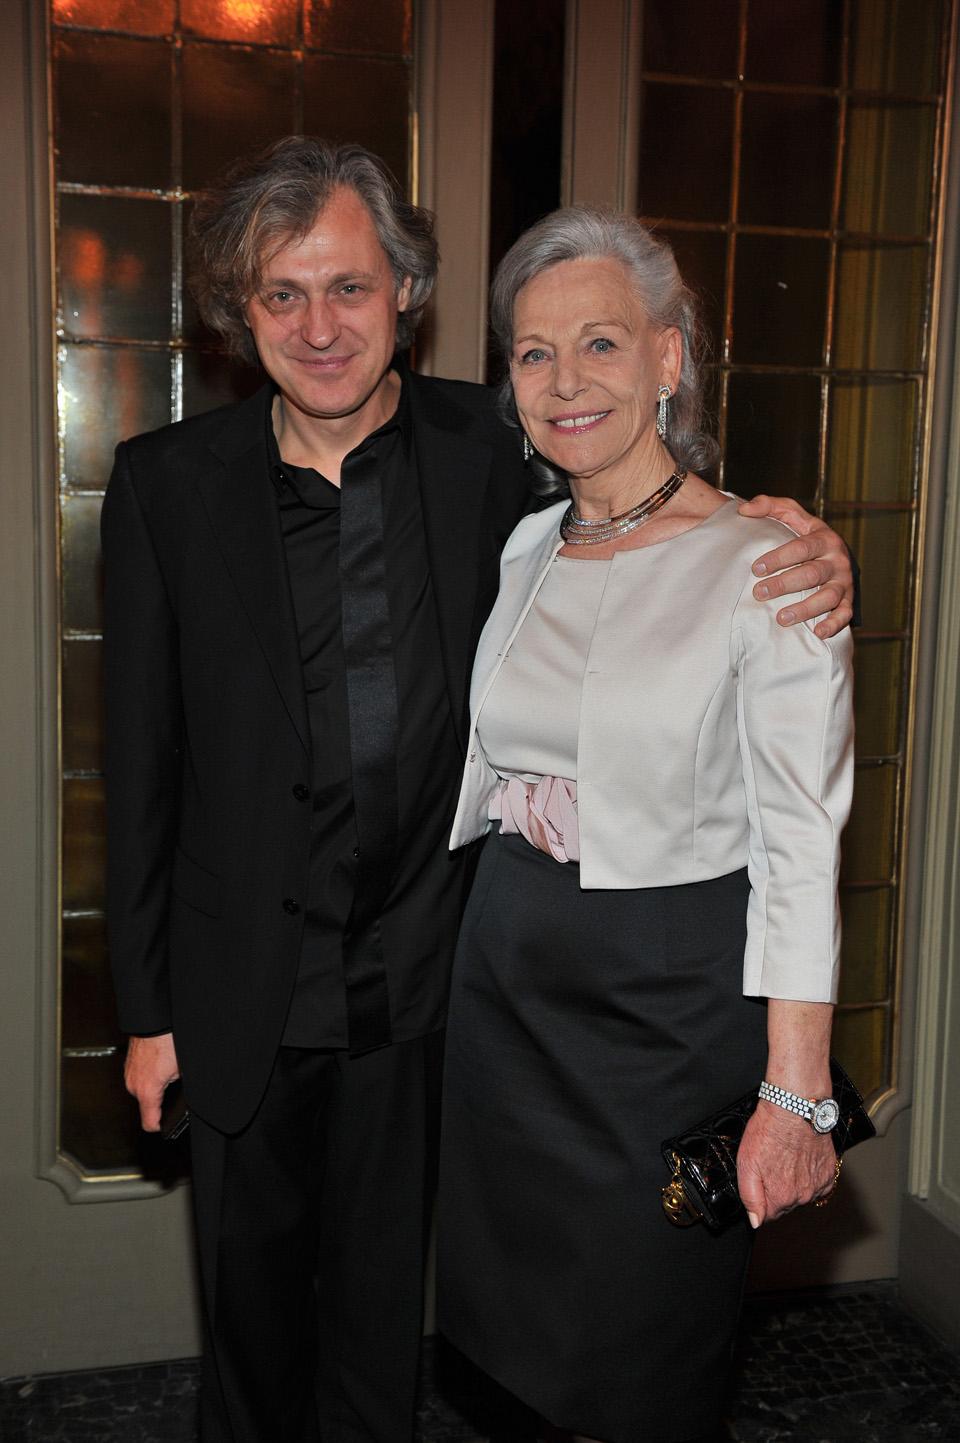 Ddimitri Naiditch & Josette Godé